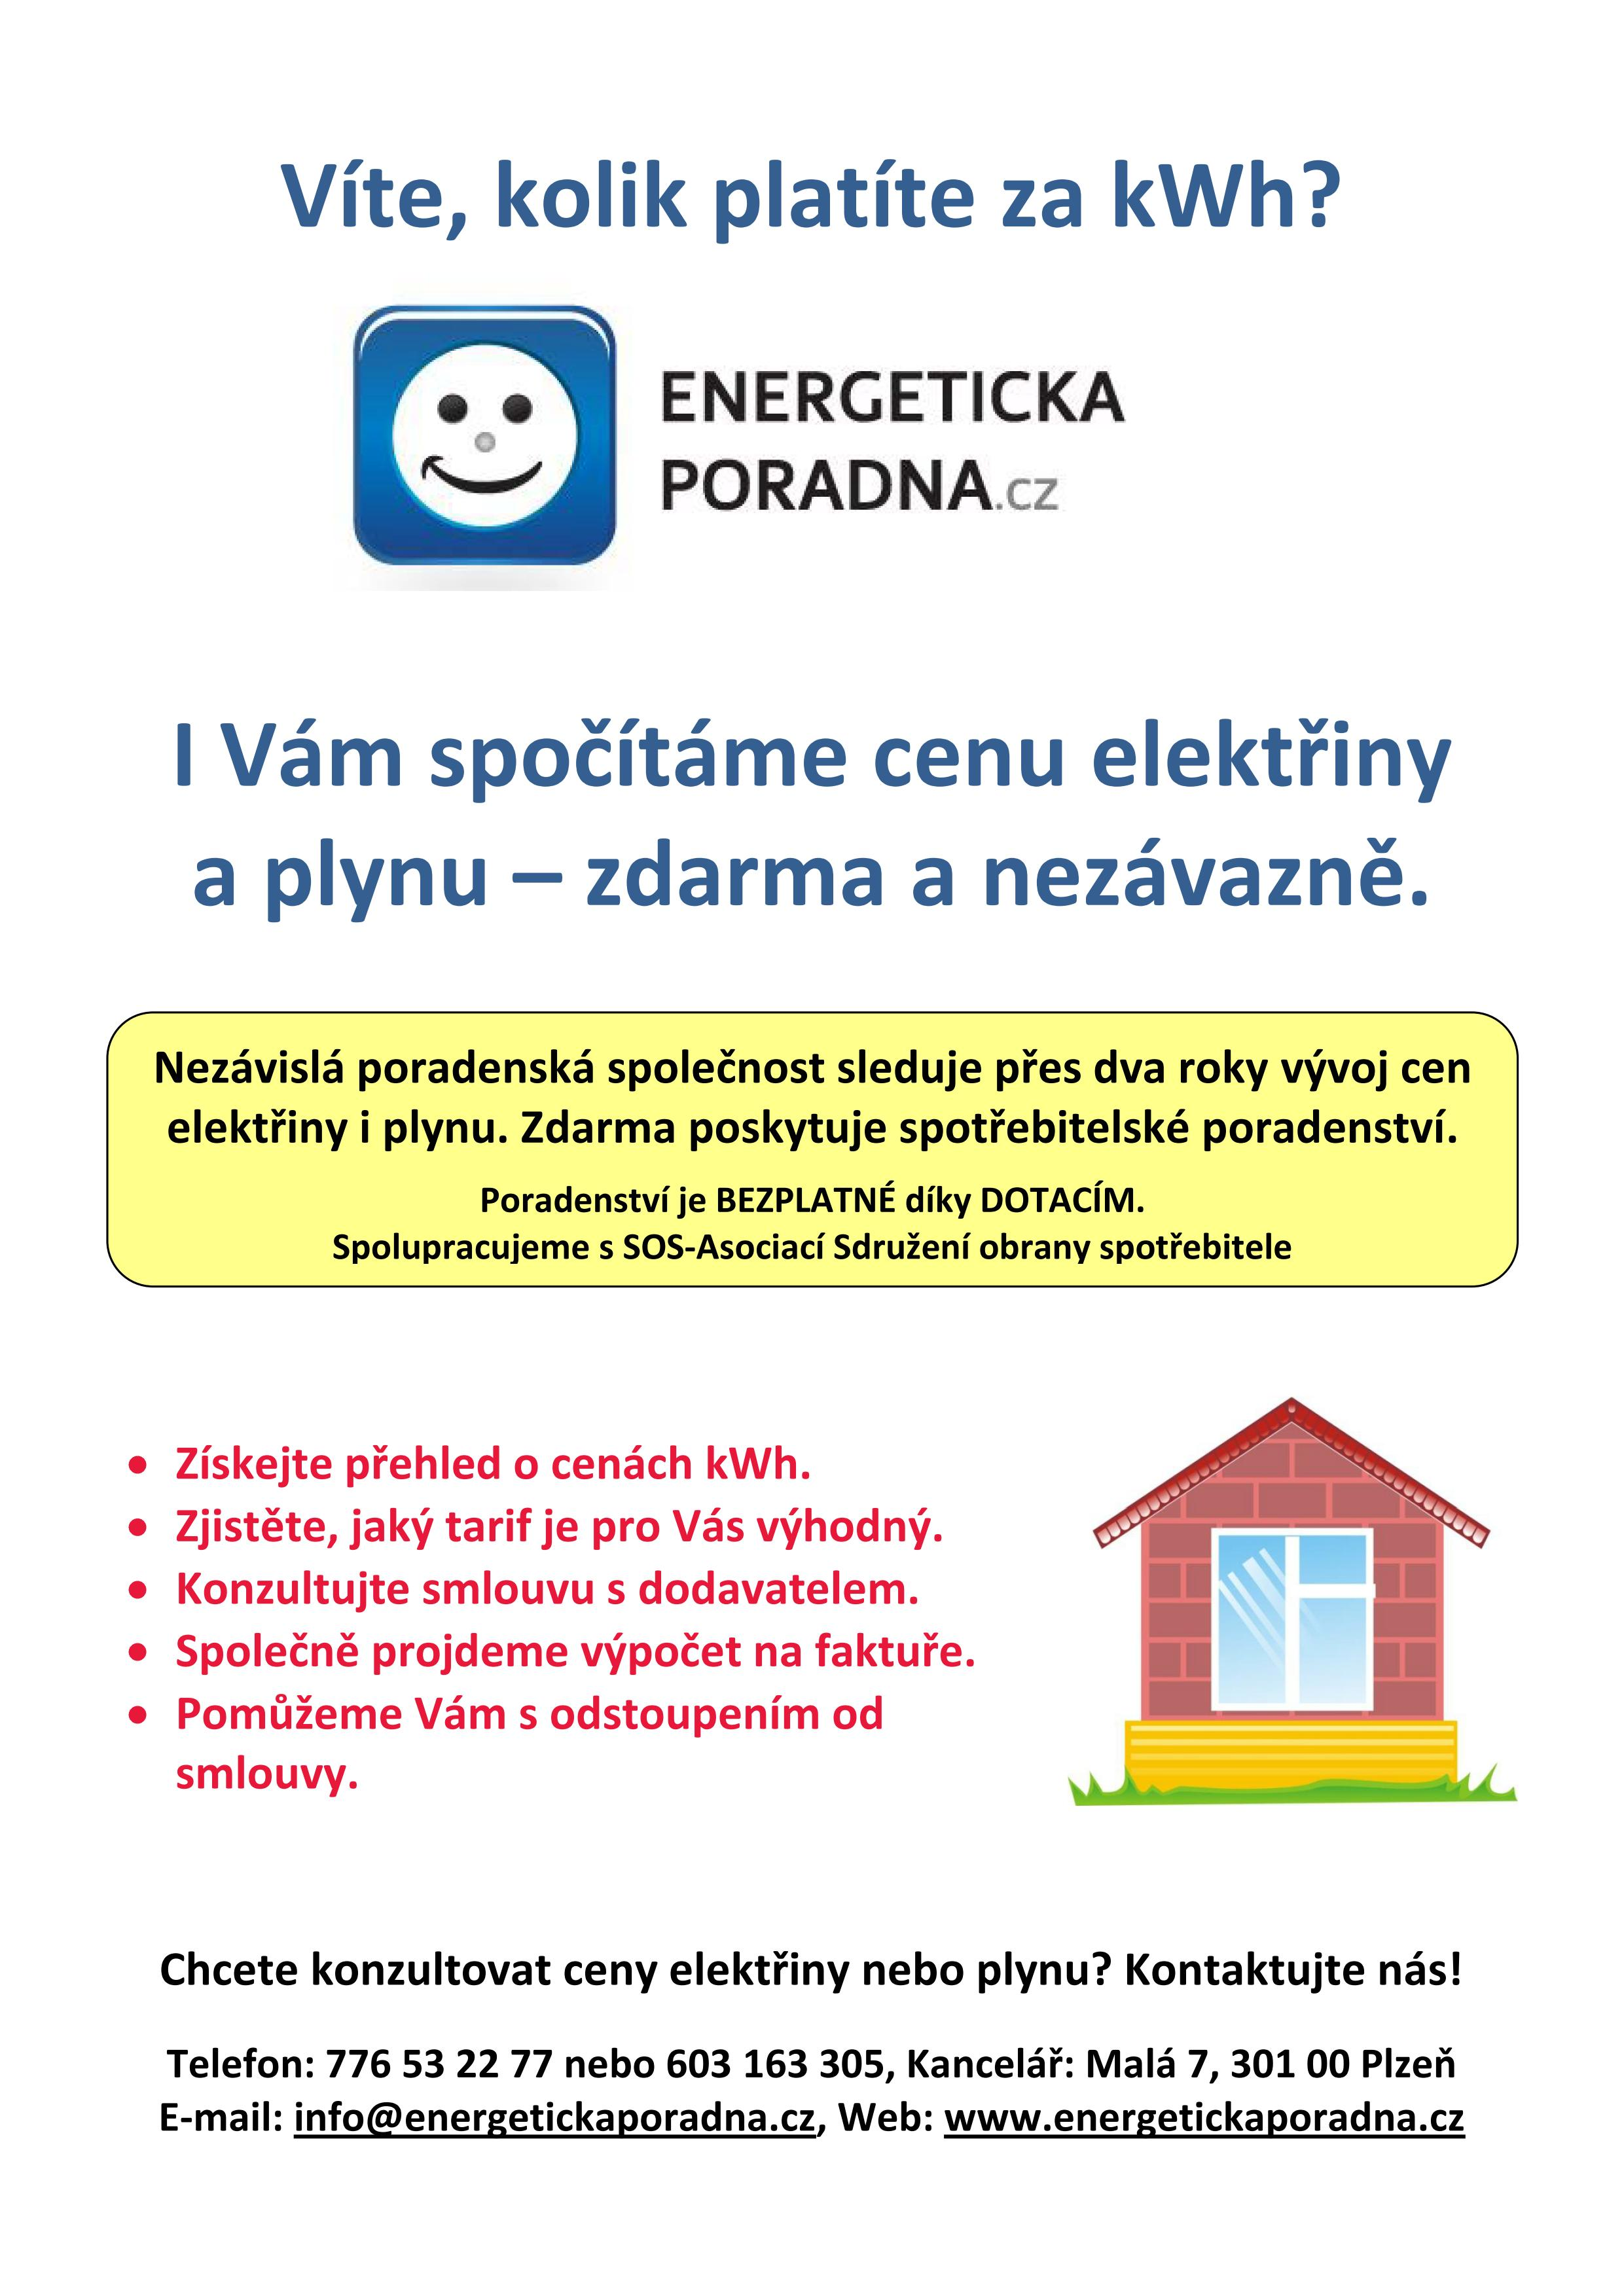 Energetická poradna